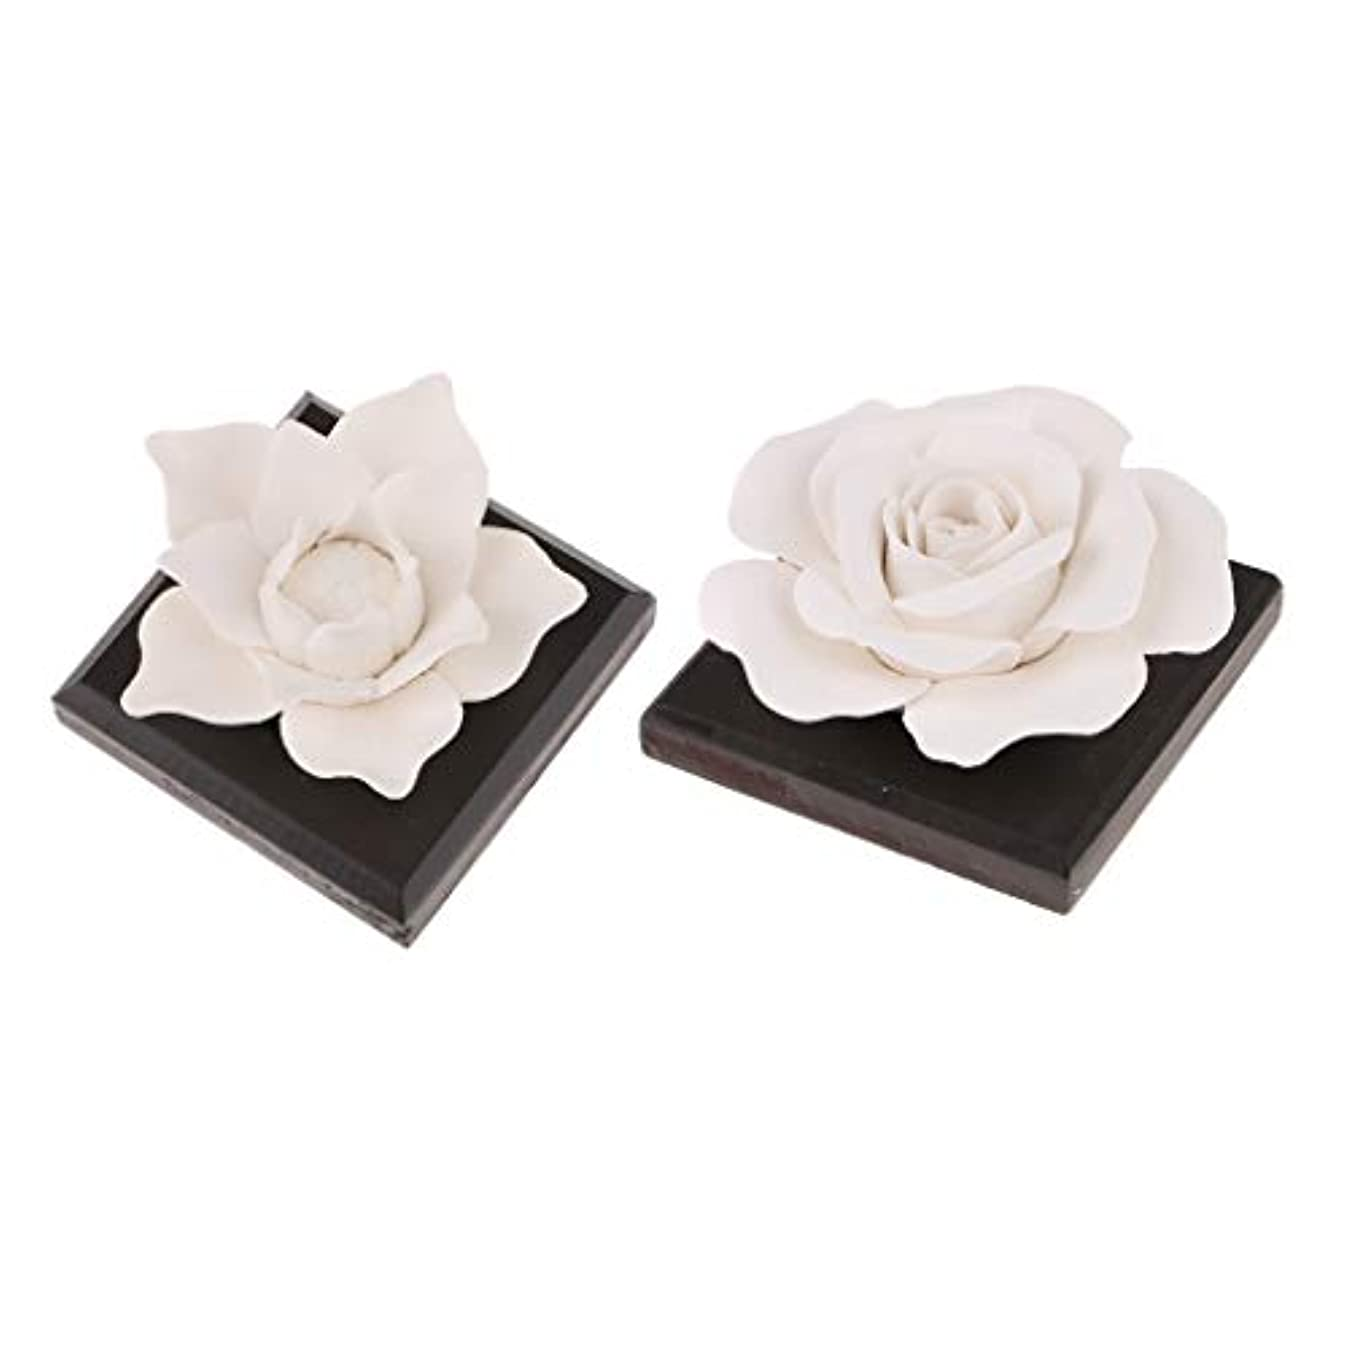 PETSOLA セラミック 花 エッセンシャルオイル 香水 香り ディフューザー 空気清浄機 装飾 2個